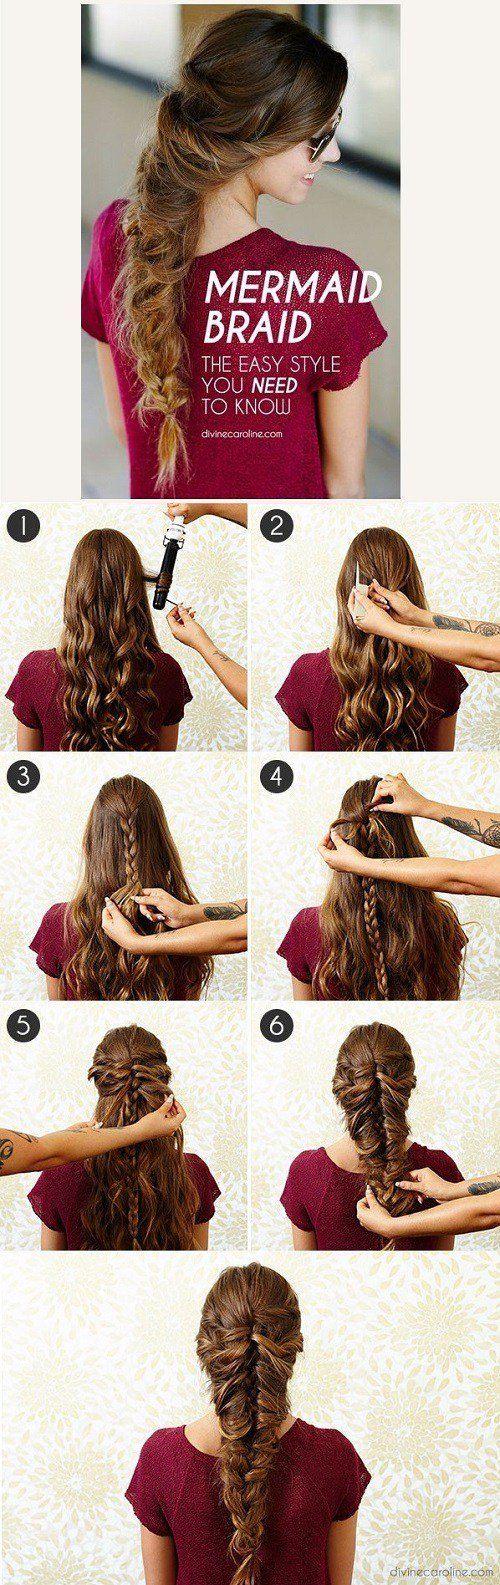 Fantástico cabelos longos tutoriais de cabelo médio - http://bompenteados.com/2017/12/05/fantastico-cabelos-longos-tutoriais-de-cabelo-medio